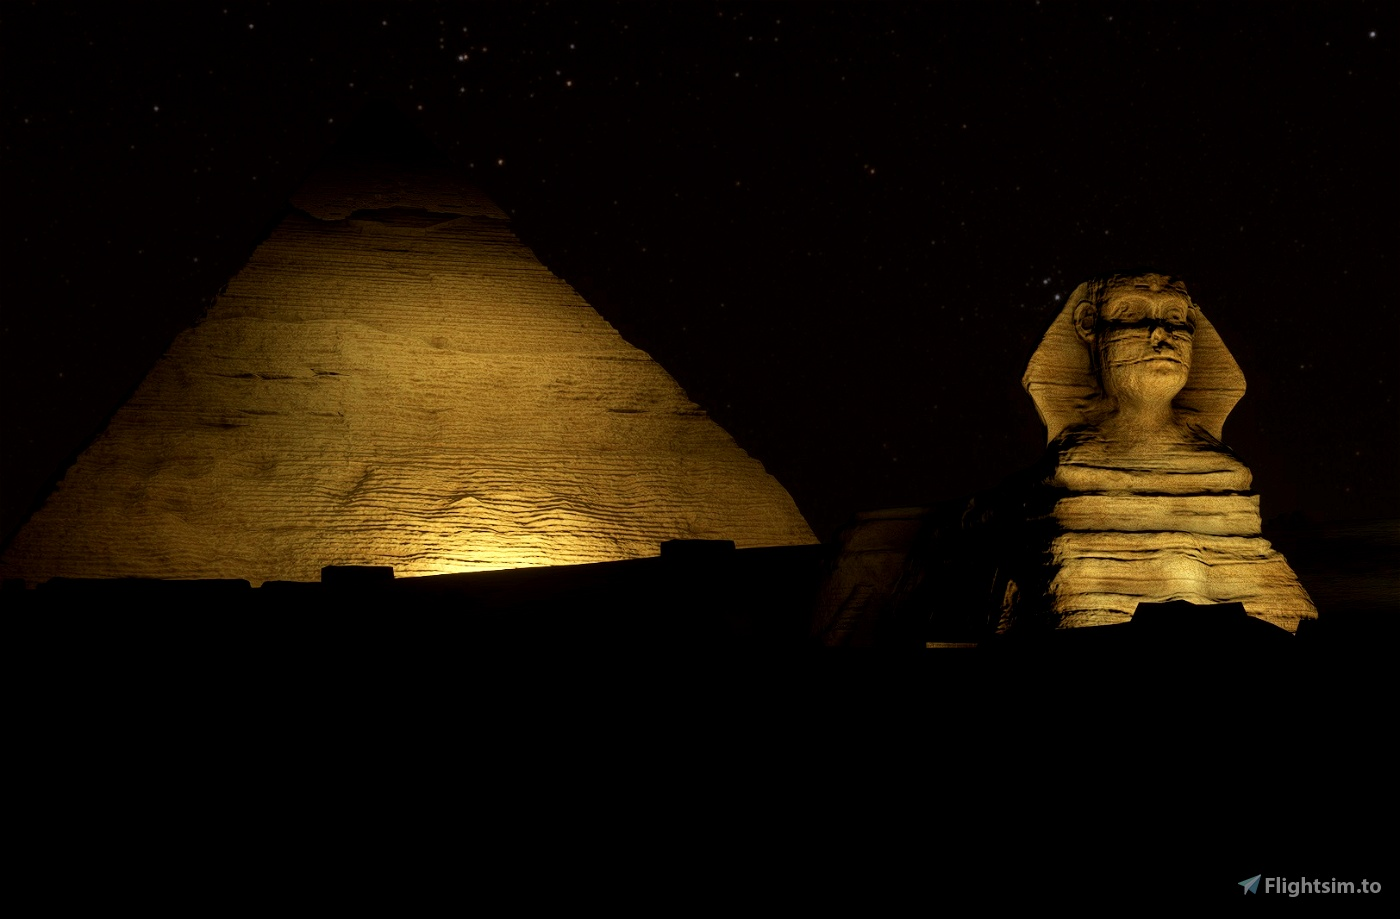 The Great Pyramids + Sphinx of Giza, Cairo, EGY - NIGHT LIGHTING SET